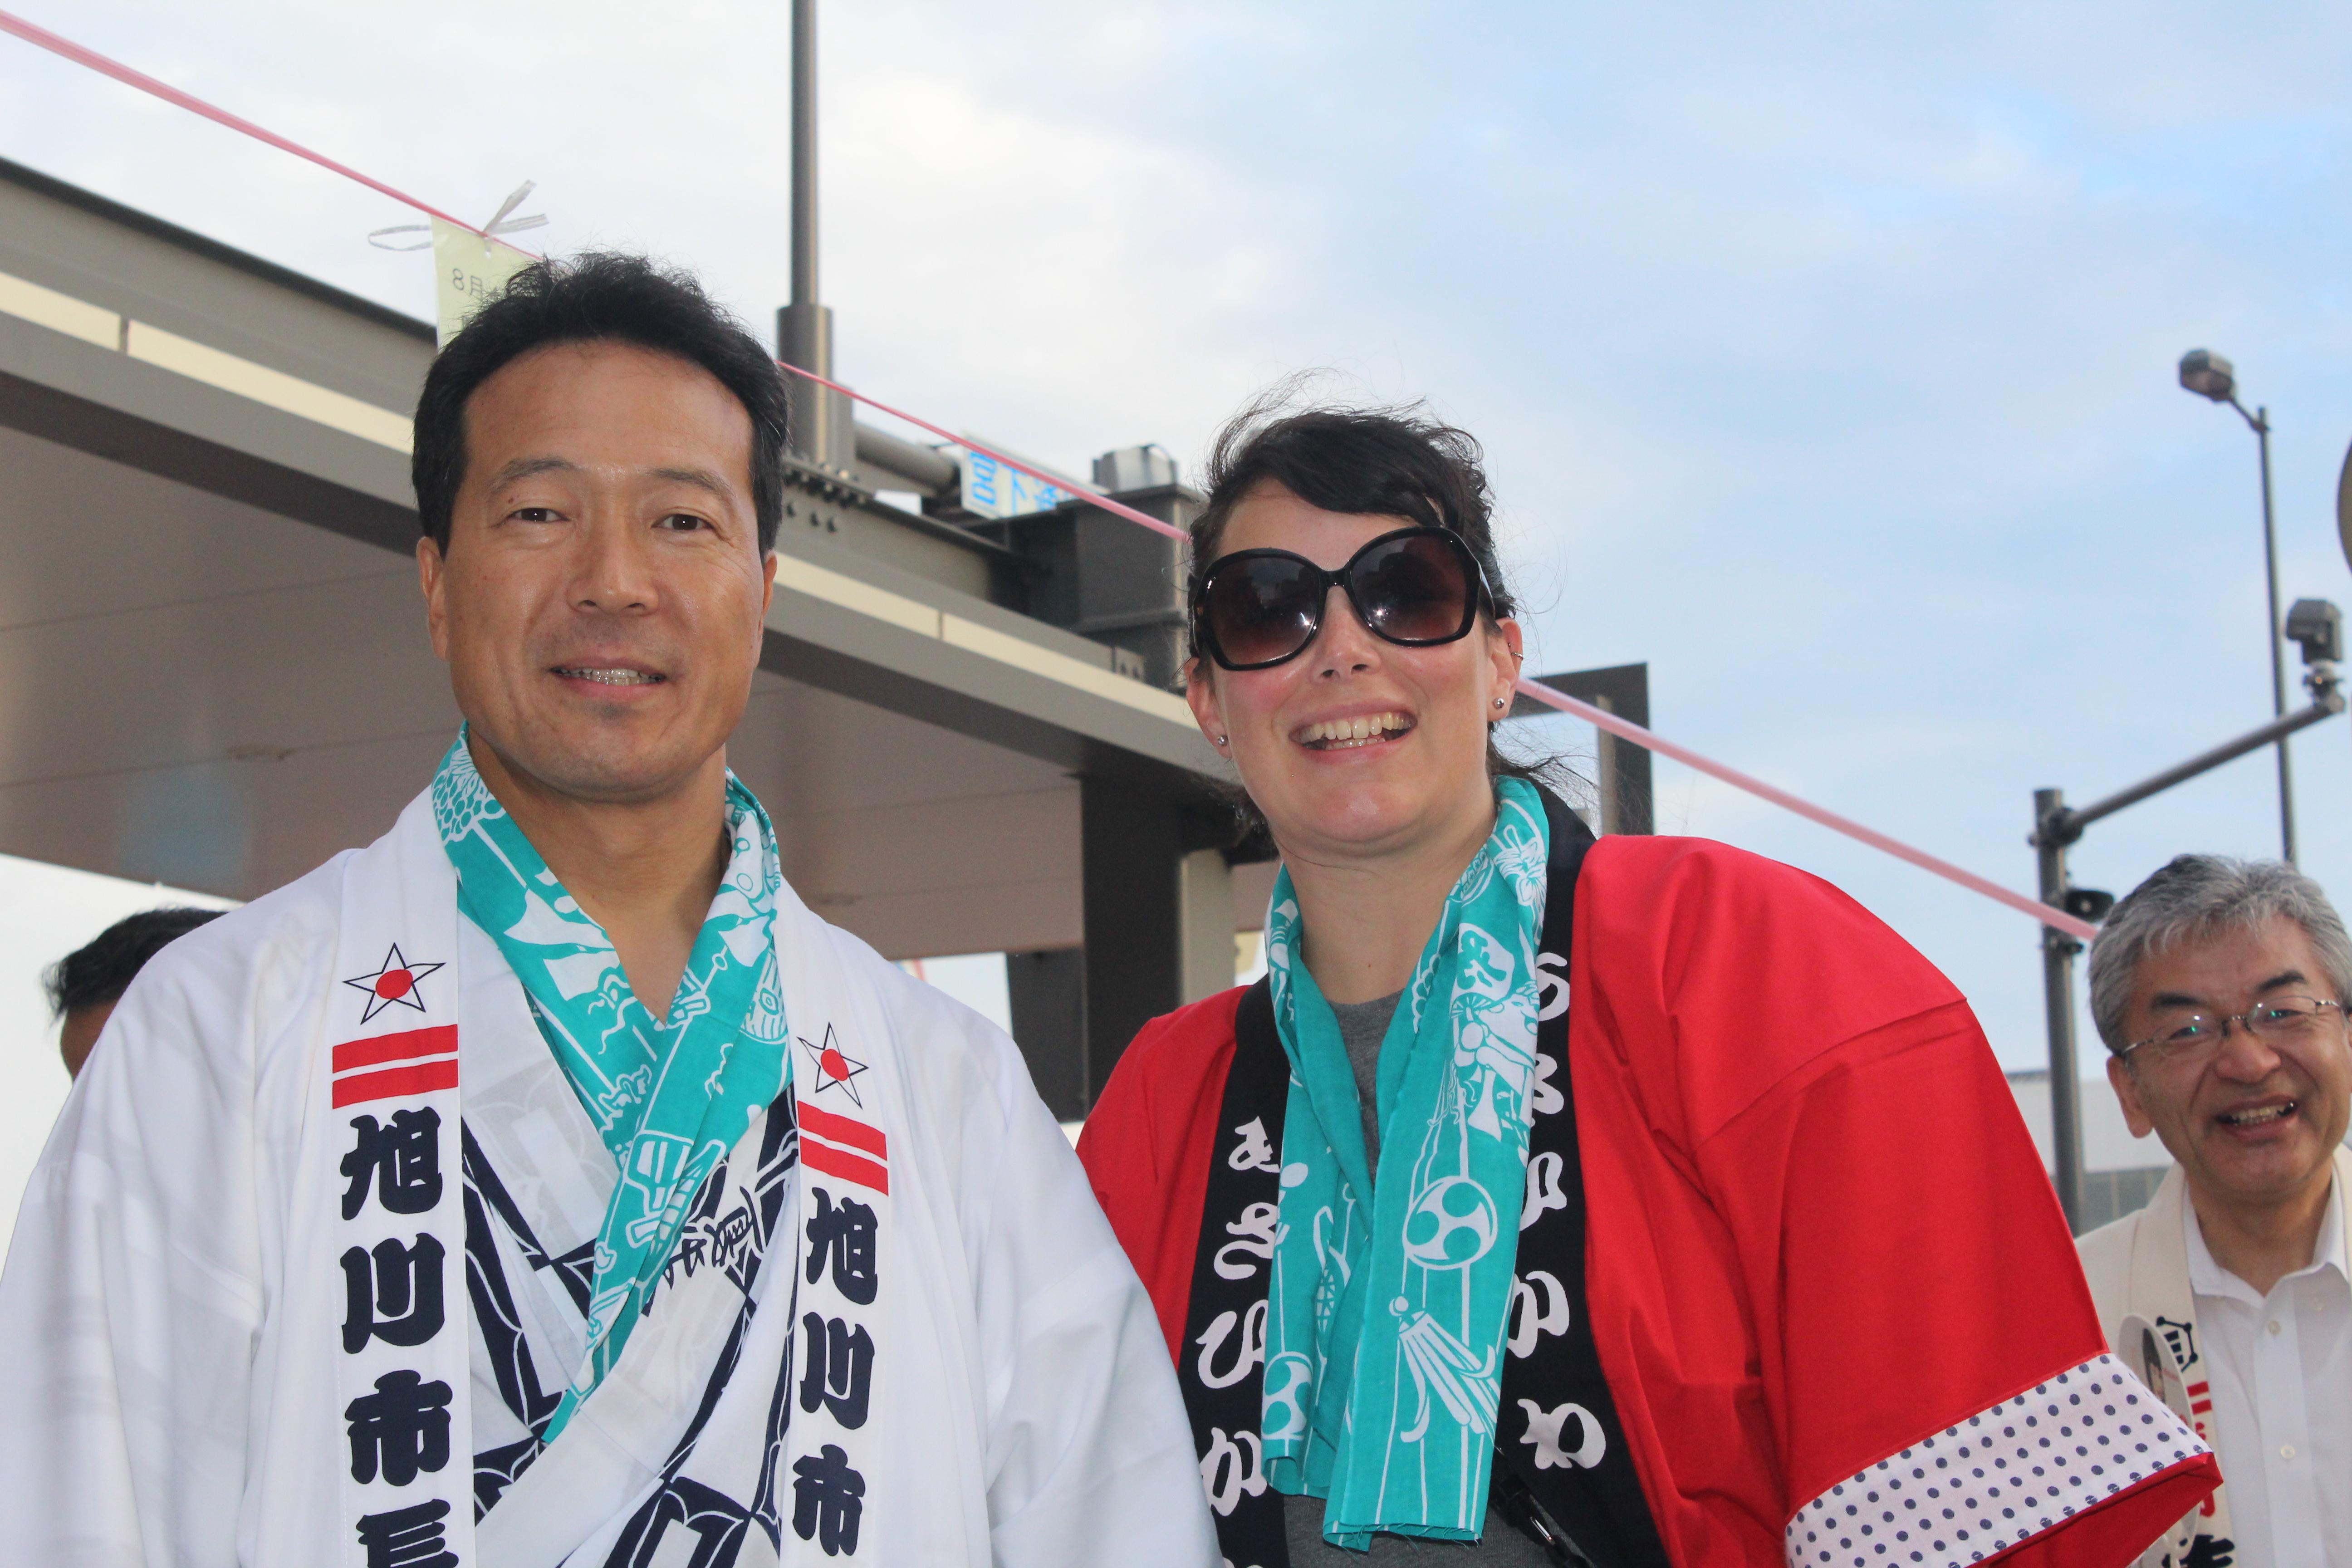 Harriett Steinbach poses with the mayor of Asahikawa, Japan